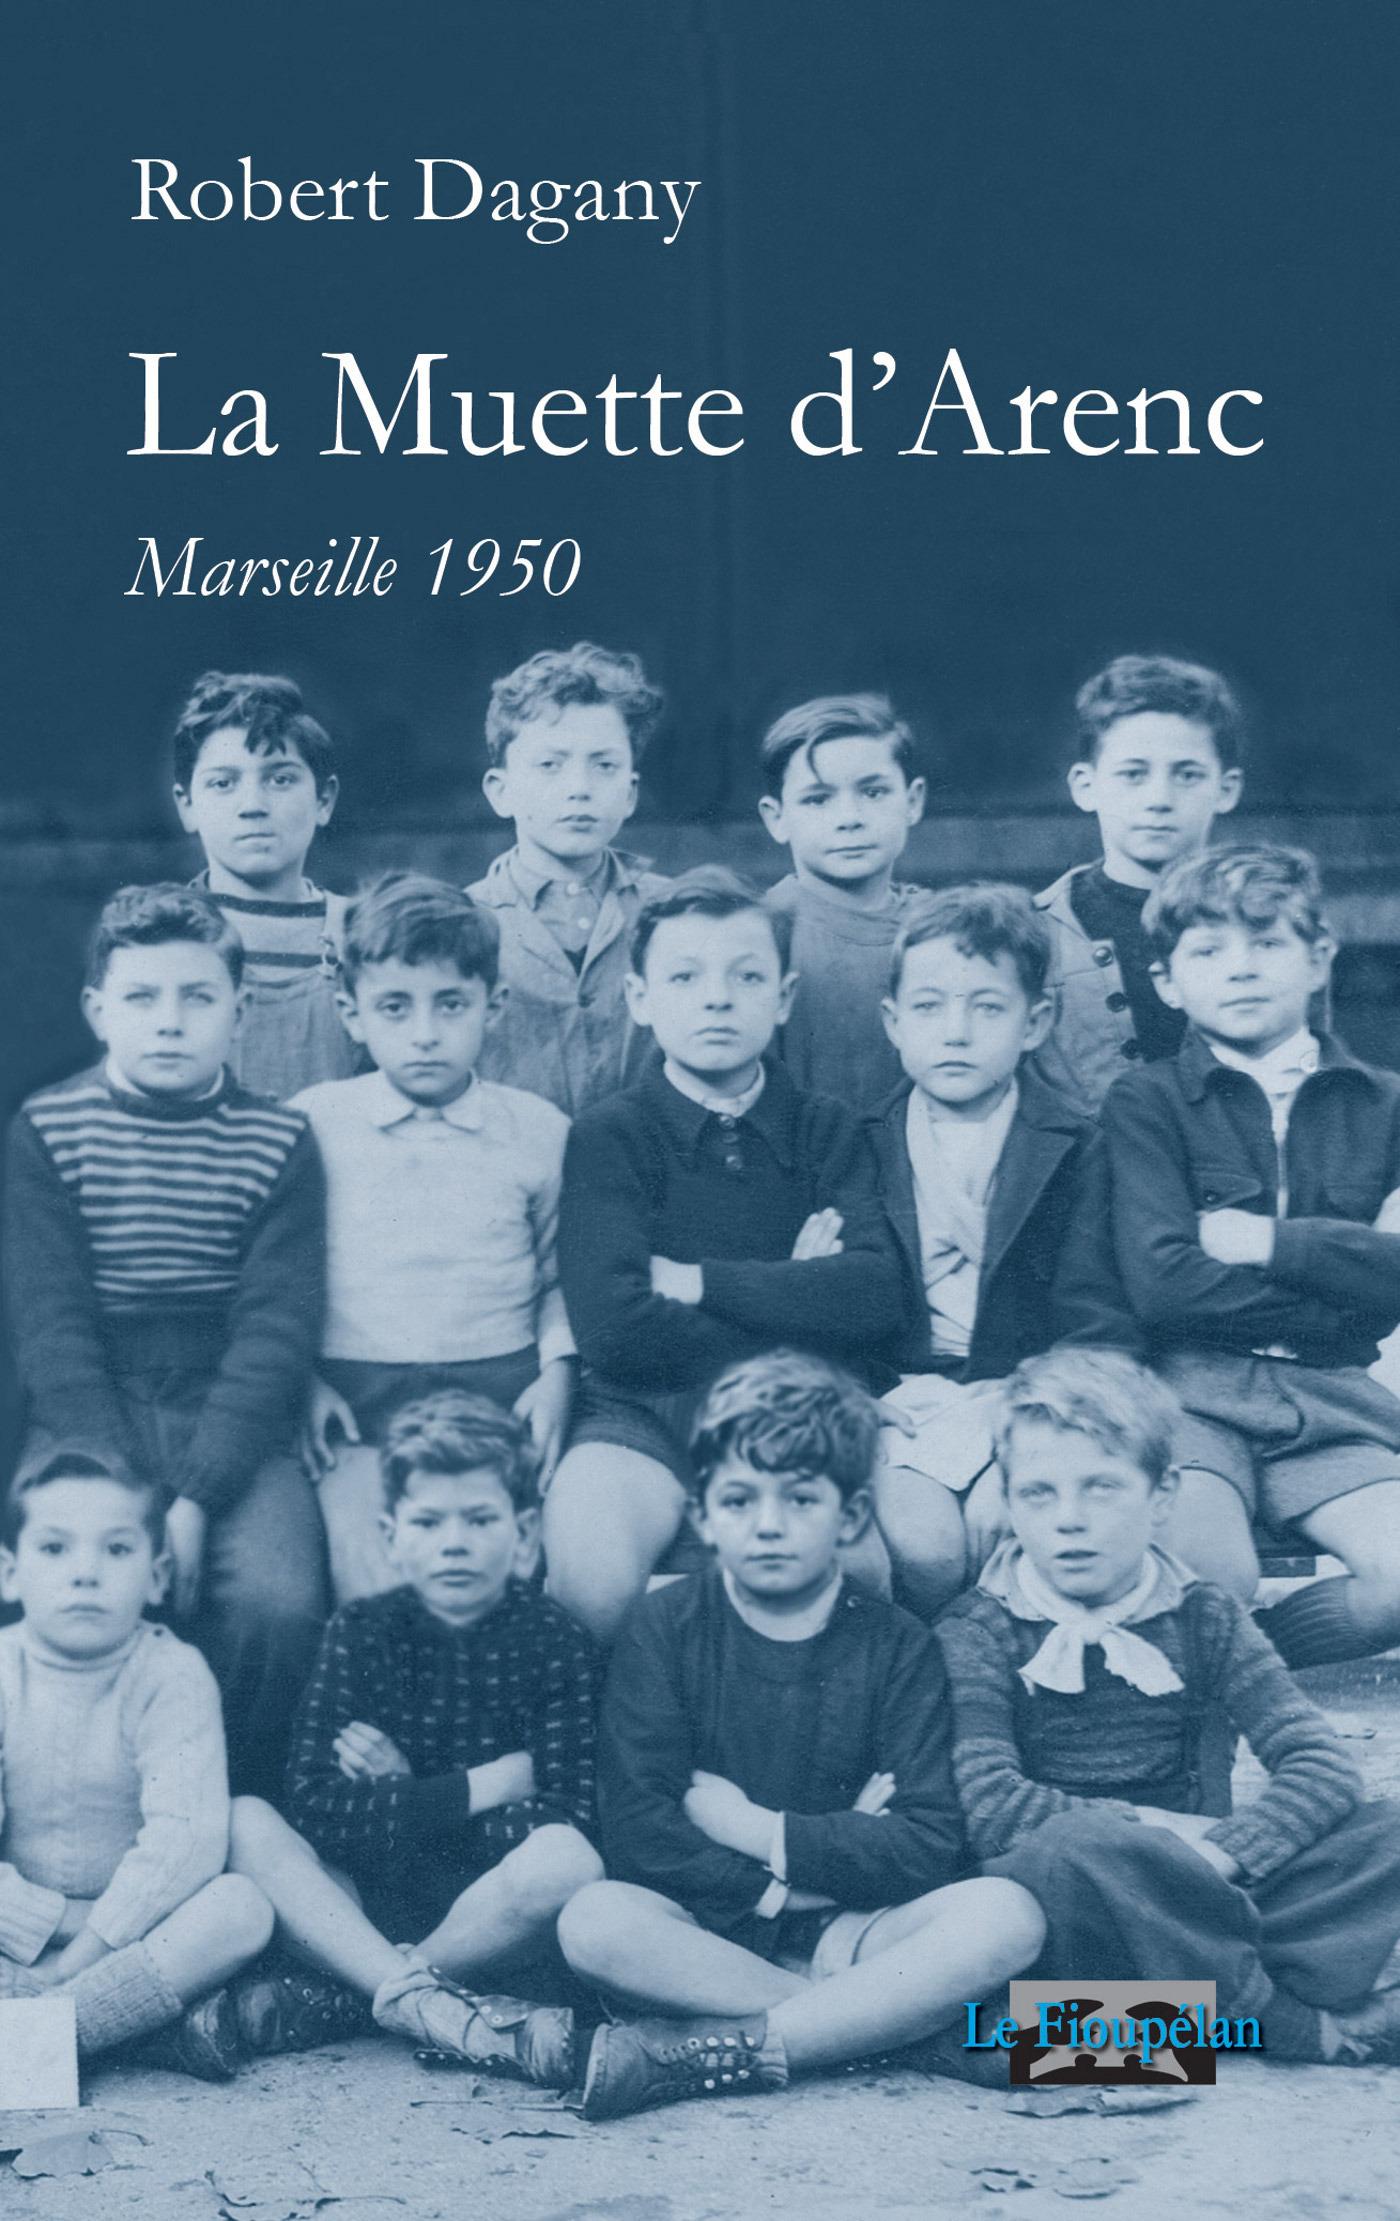 la muette d'Arenc,  Marseille 1950